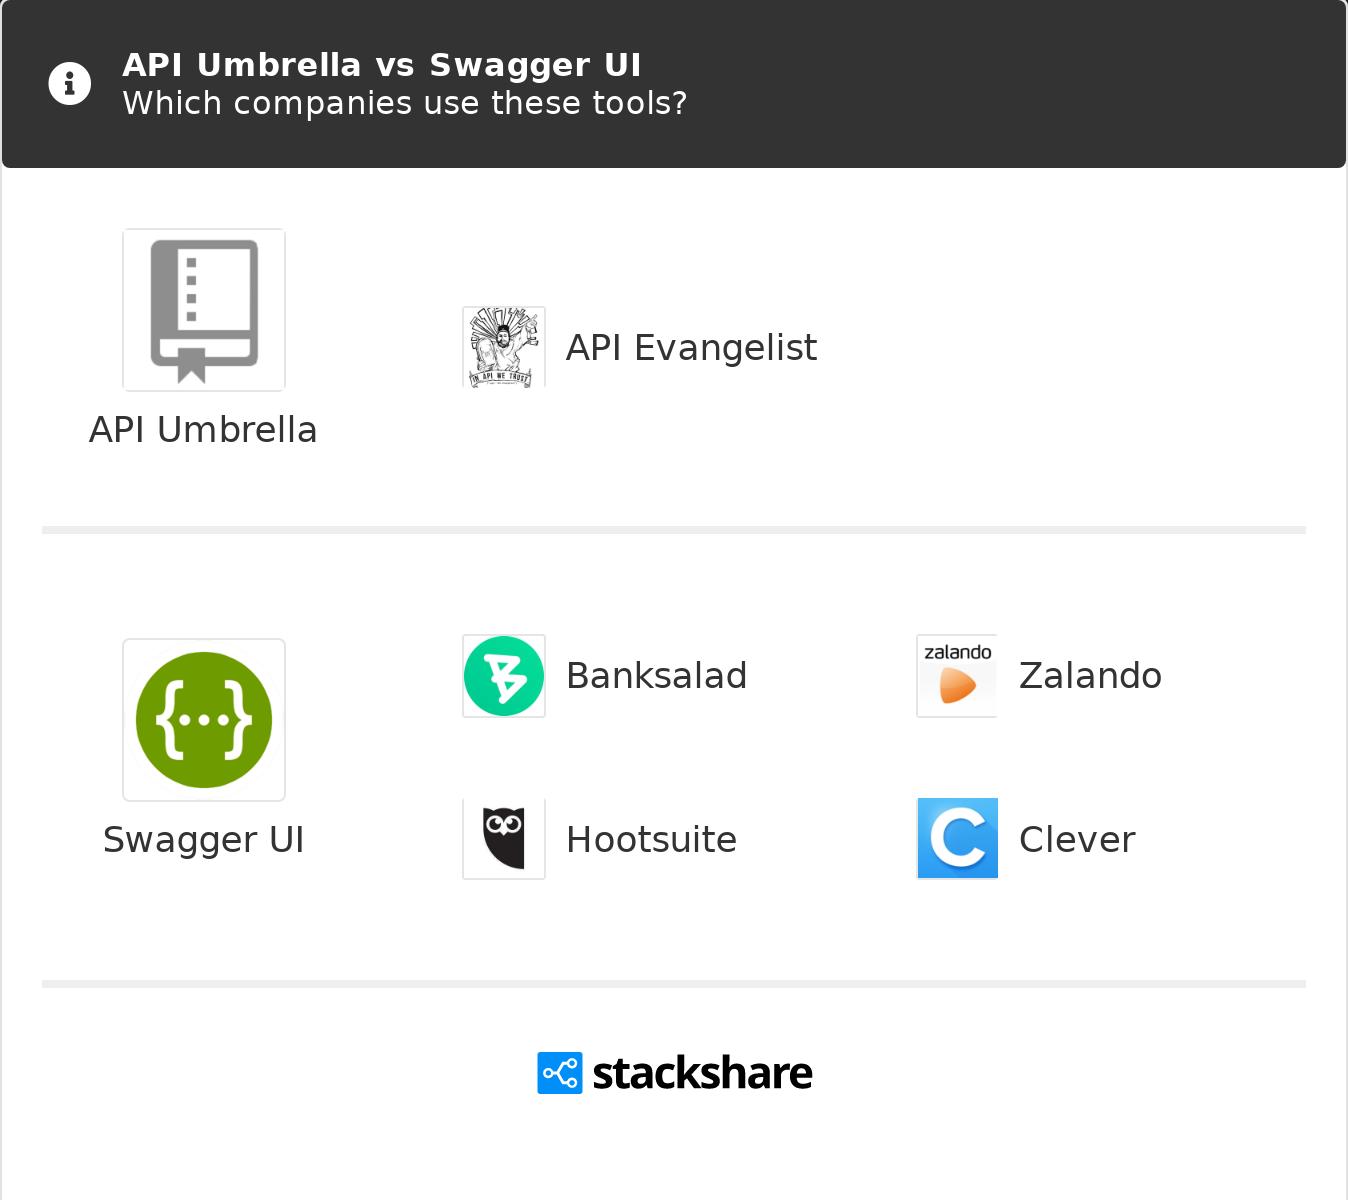 API Umbrella vs Swagger UI | What are the differences?